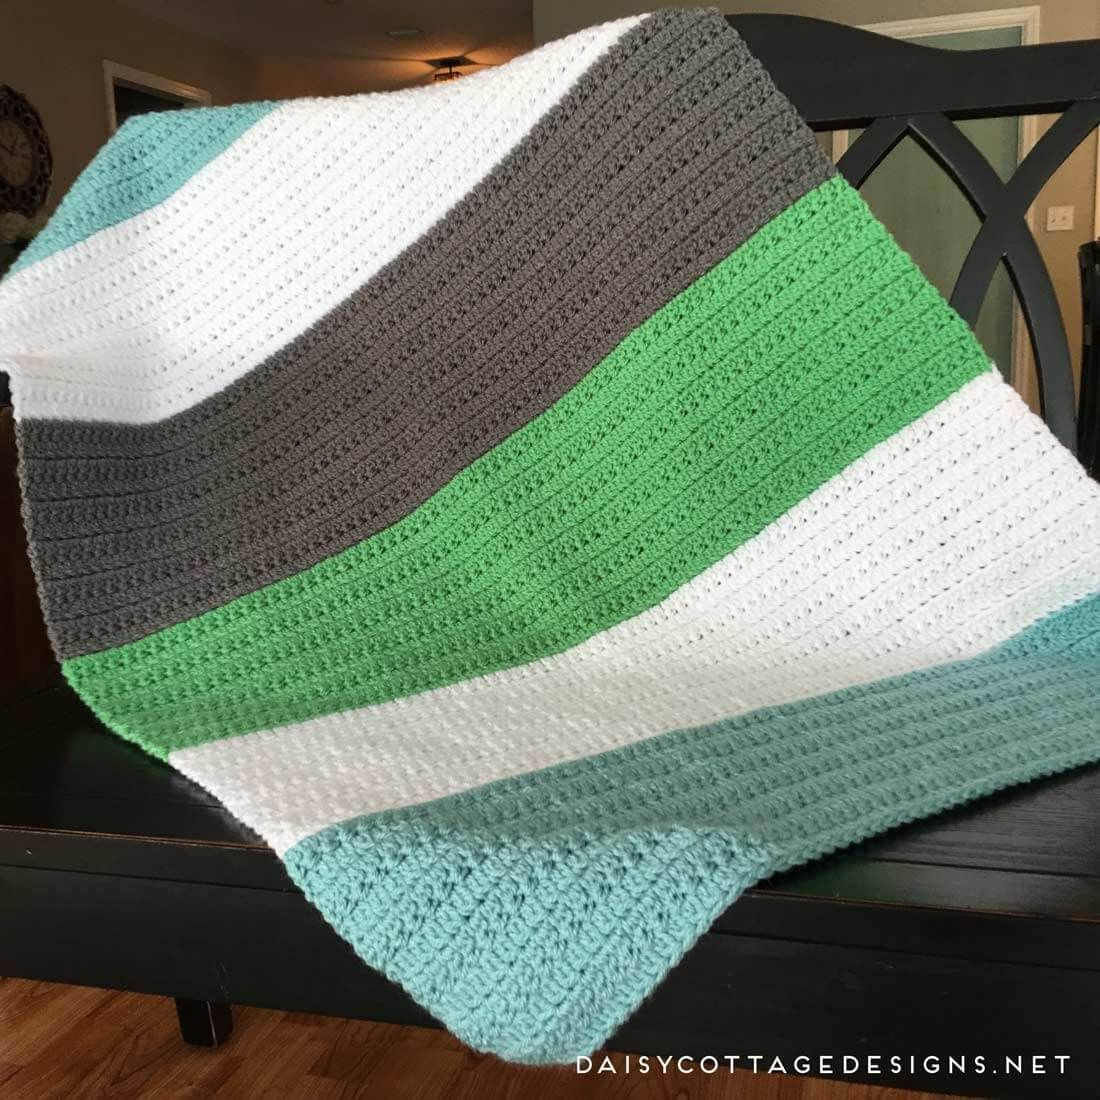 Crochet Baby Blanket from